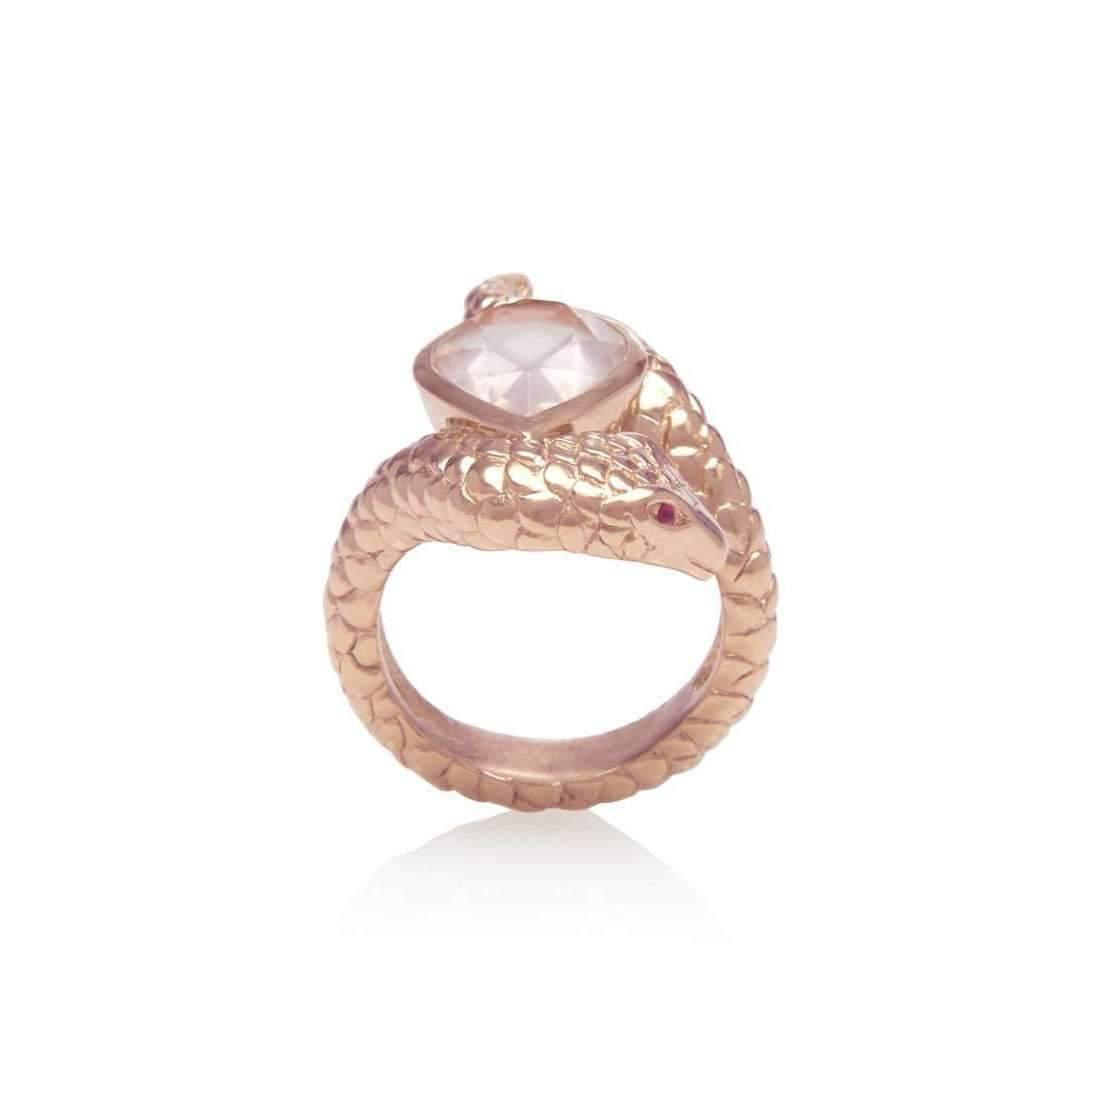 Alexandra Alberta Arizona Carnelian Ring - UK L - US 5 1/2 - EU 51 3/4 z8SXWx